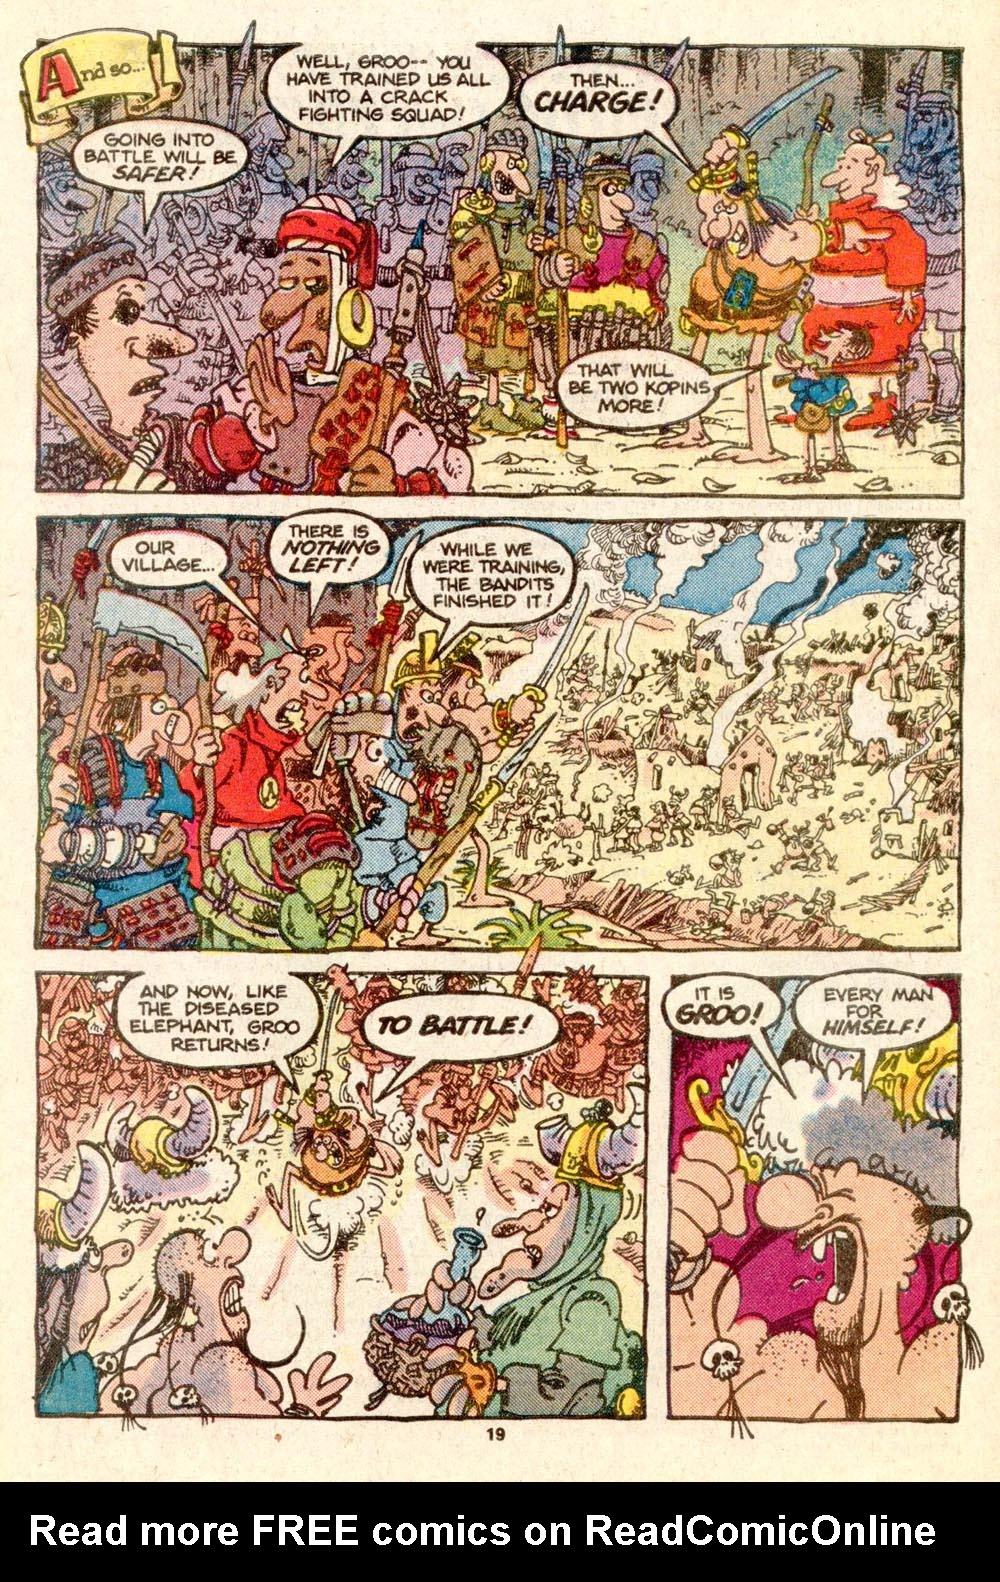 Read online Sergio Aragonés Groo the Wanderer comic -  Issue #25 - 19